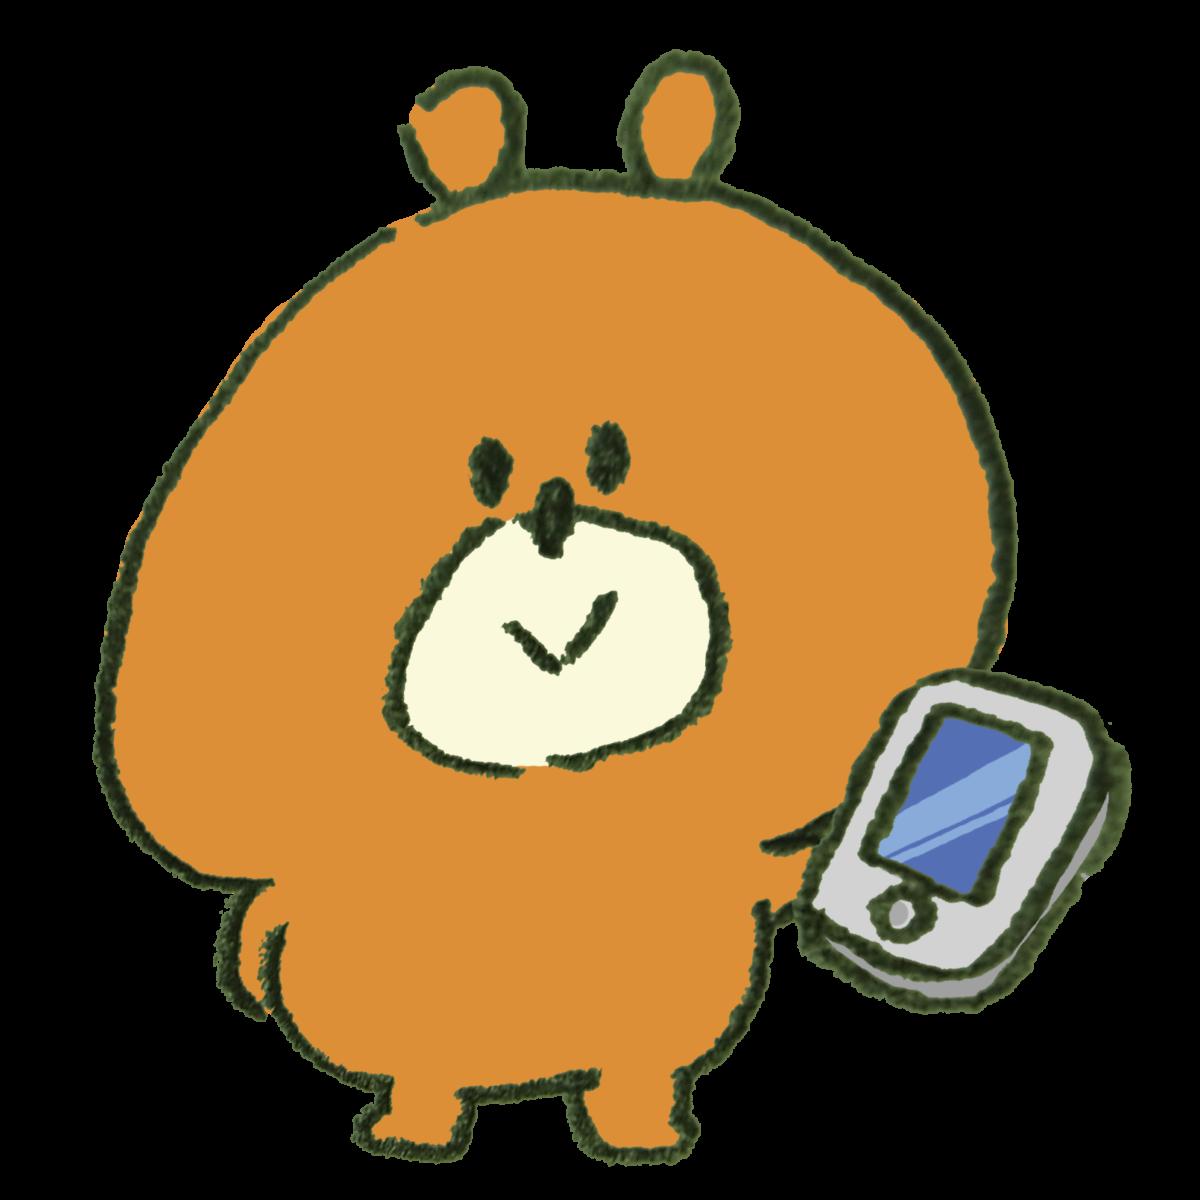 https://bukizatsu.site/wp-content/uploads/2019/10/sumahokuma-e1571608811125.png